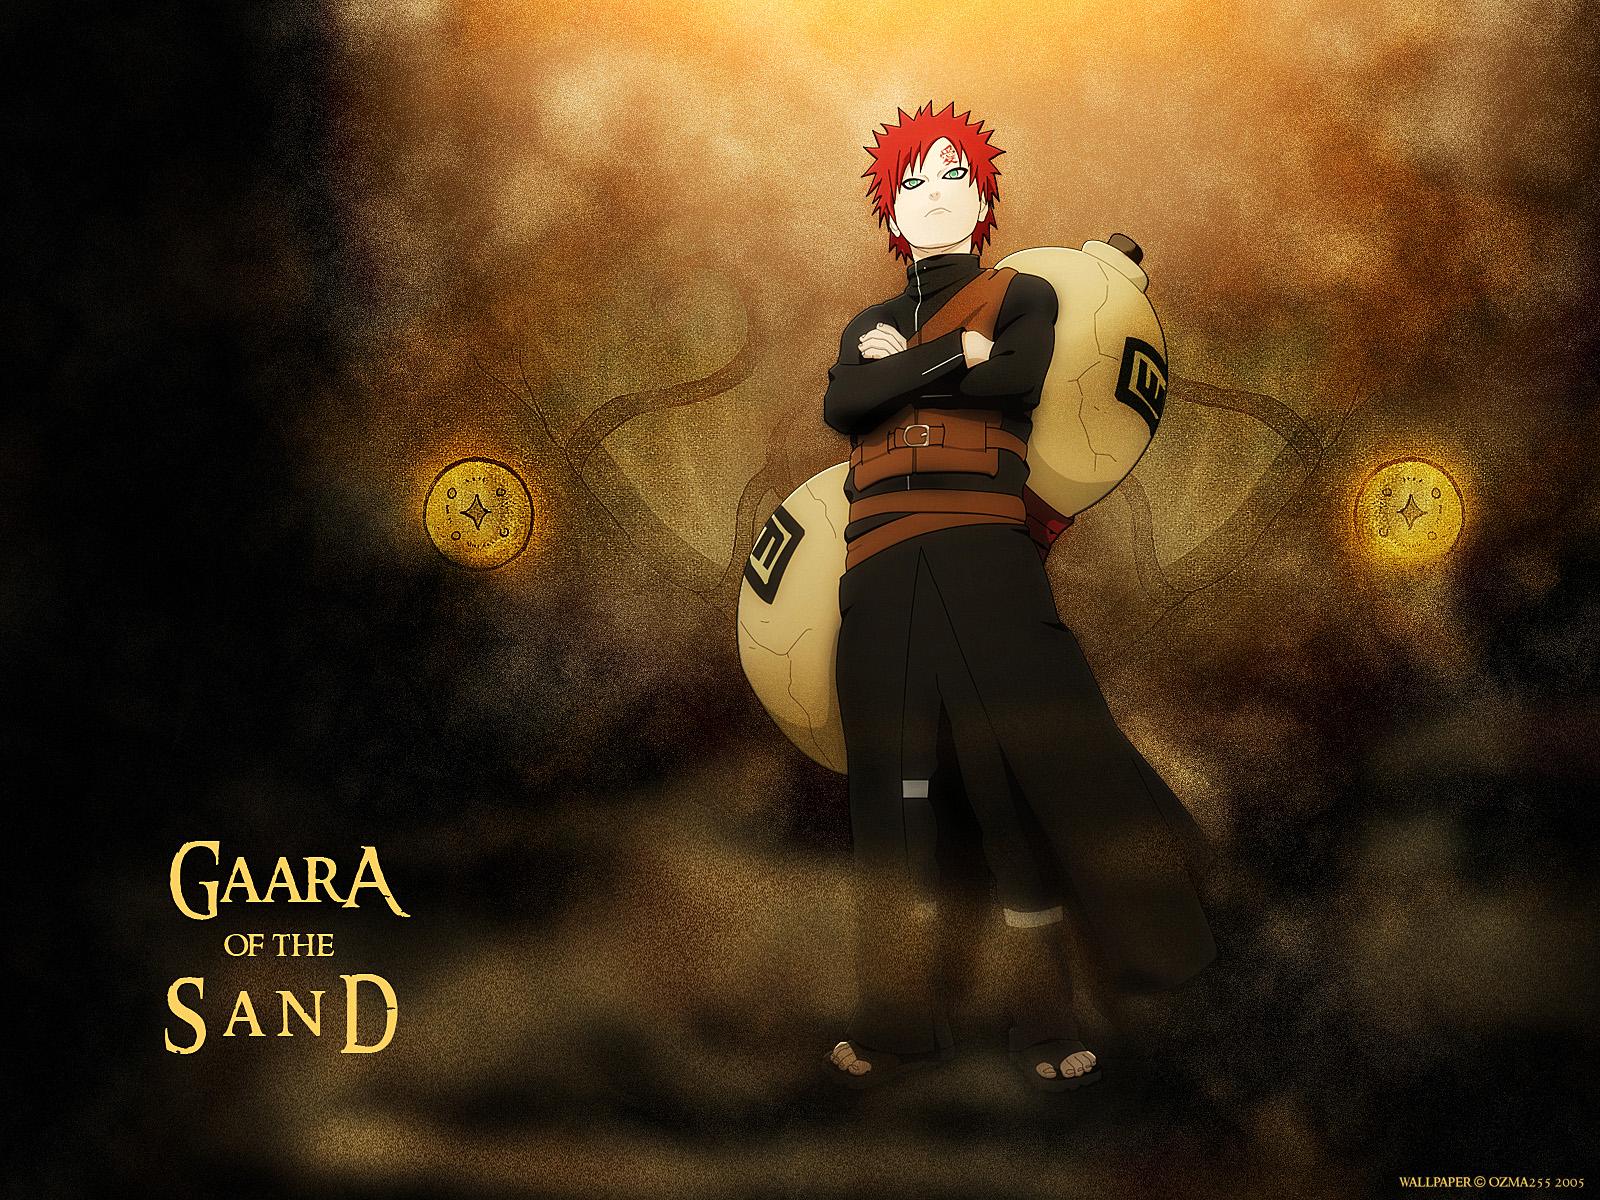 Anime Wallpaper Gaara HD Naruto Movie Anime Wallpapers 1600x1200